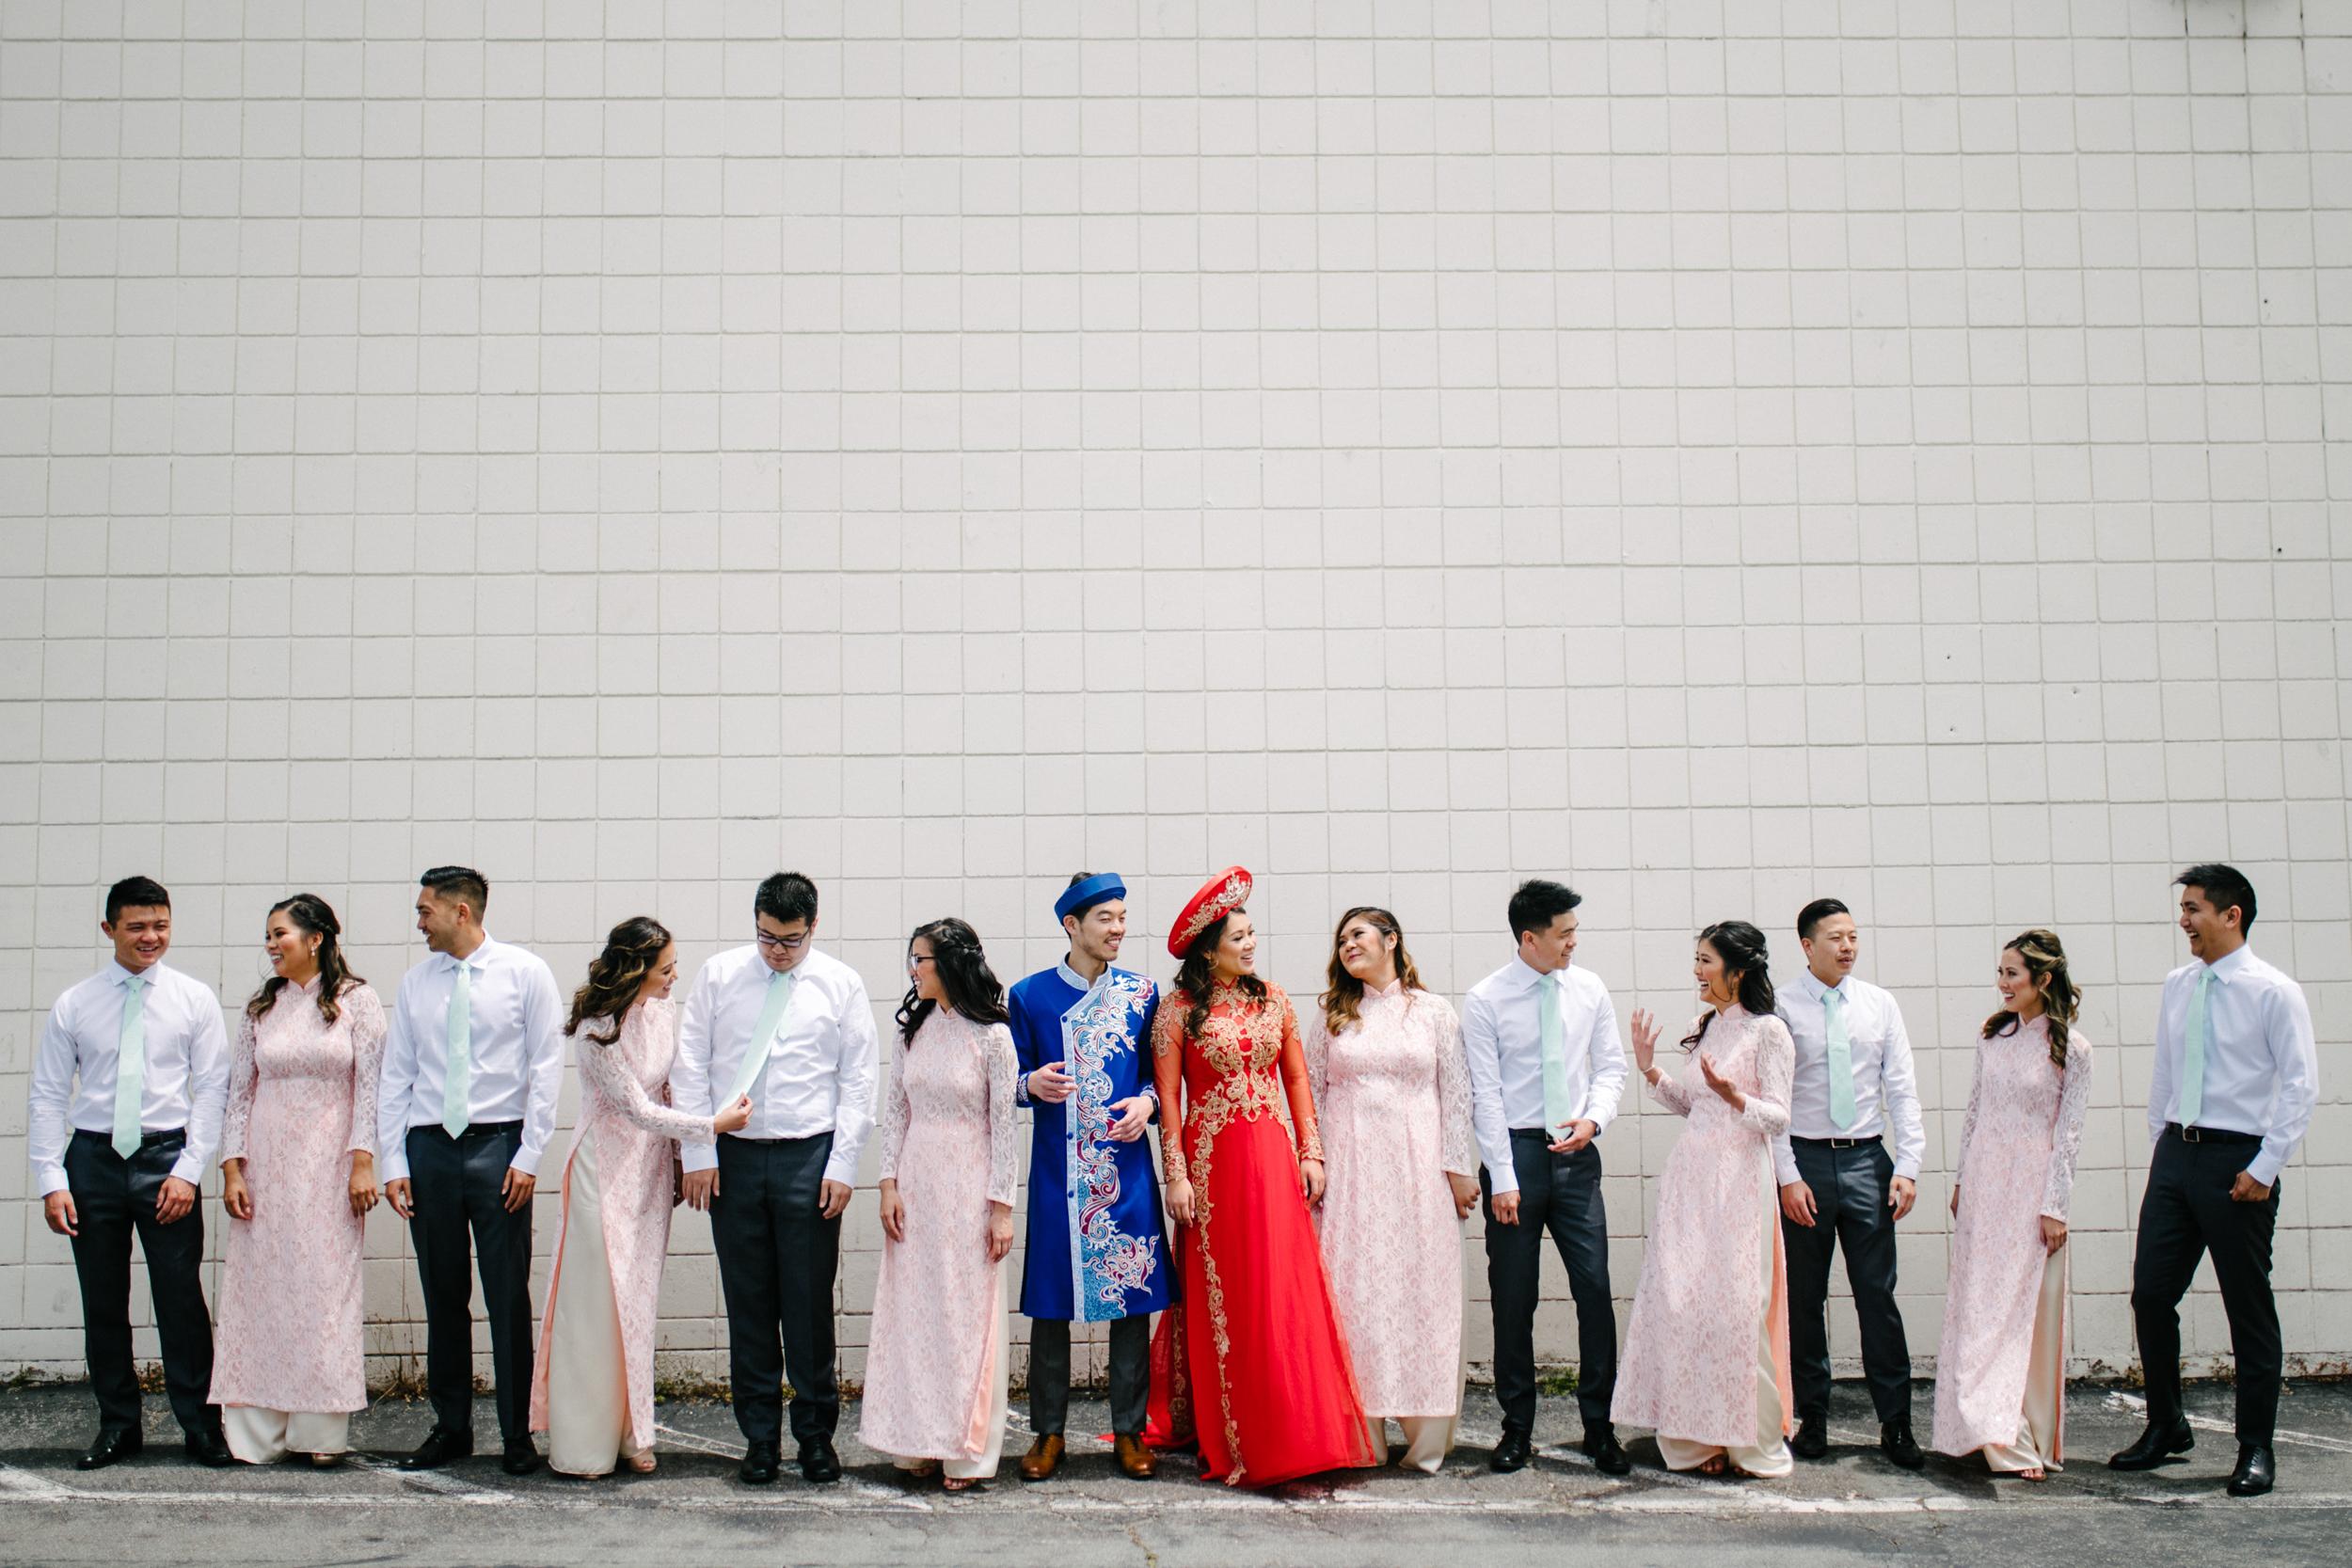 wedding_coronado_community_center-6.jpg